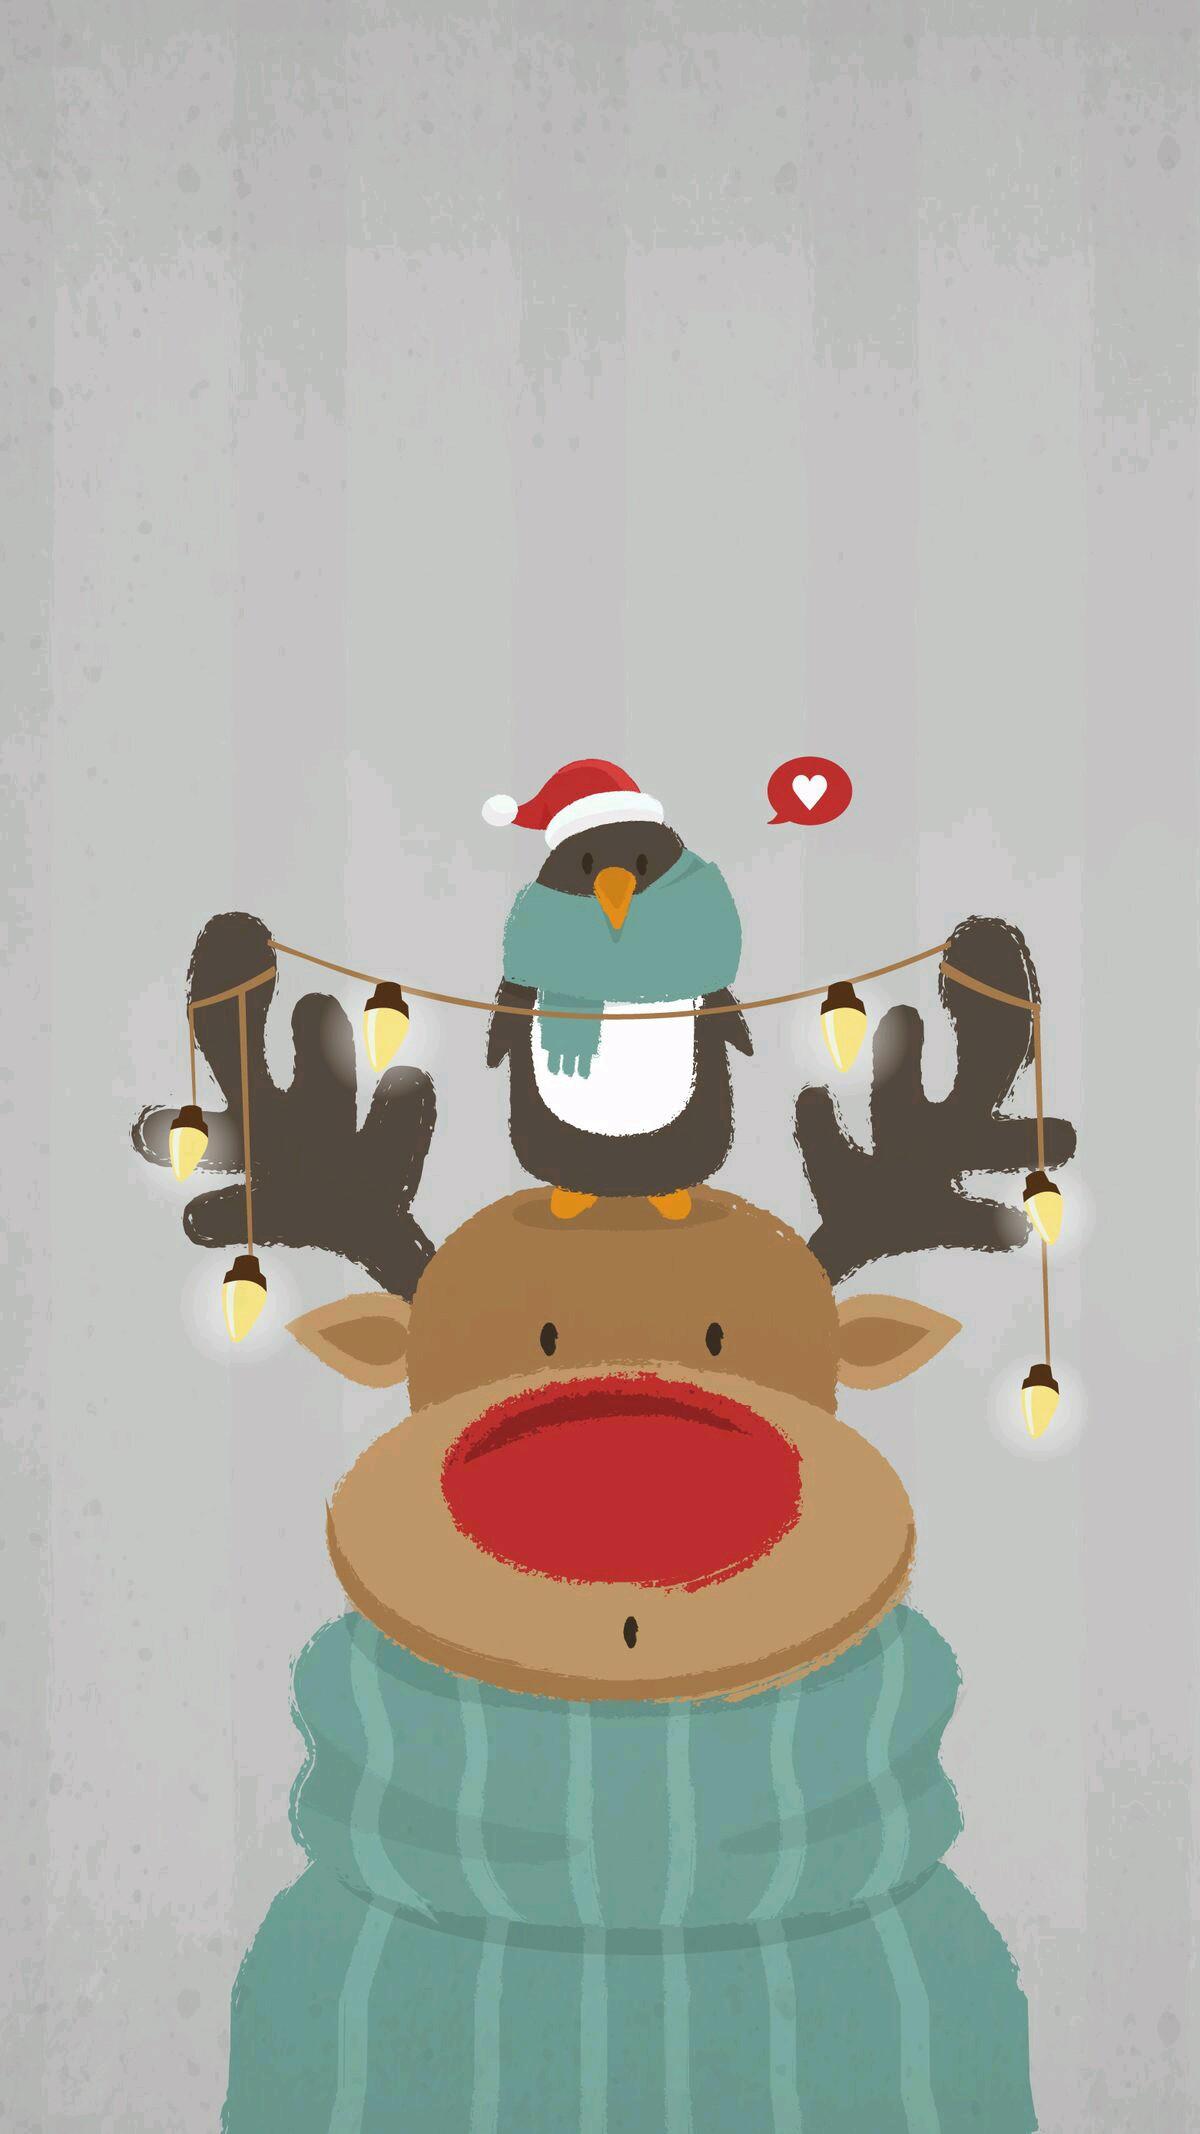 11 Quick & Easy Christmas Cookie & DessertRecipes